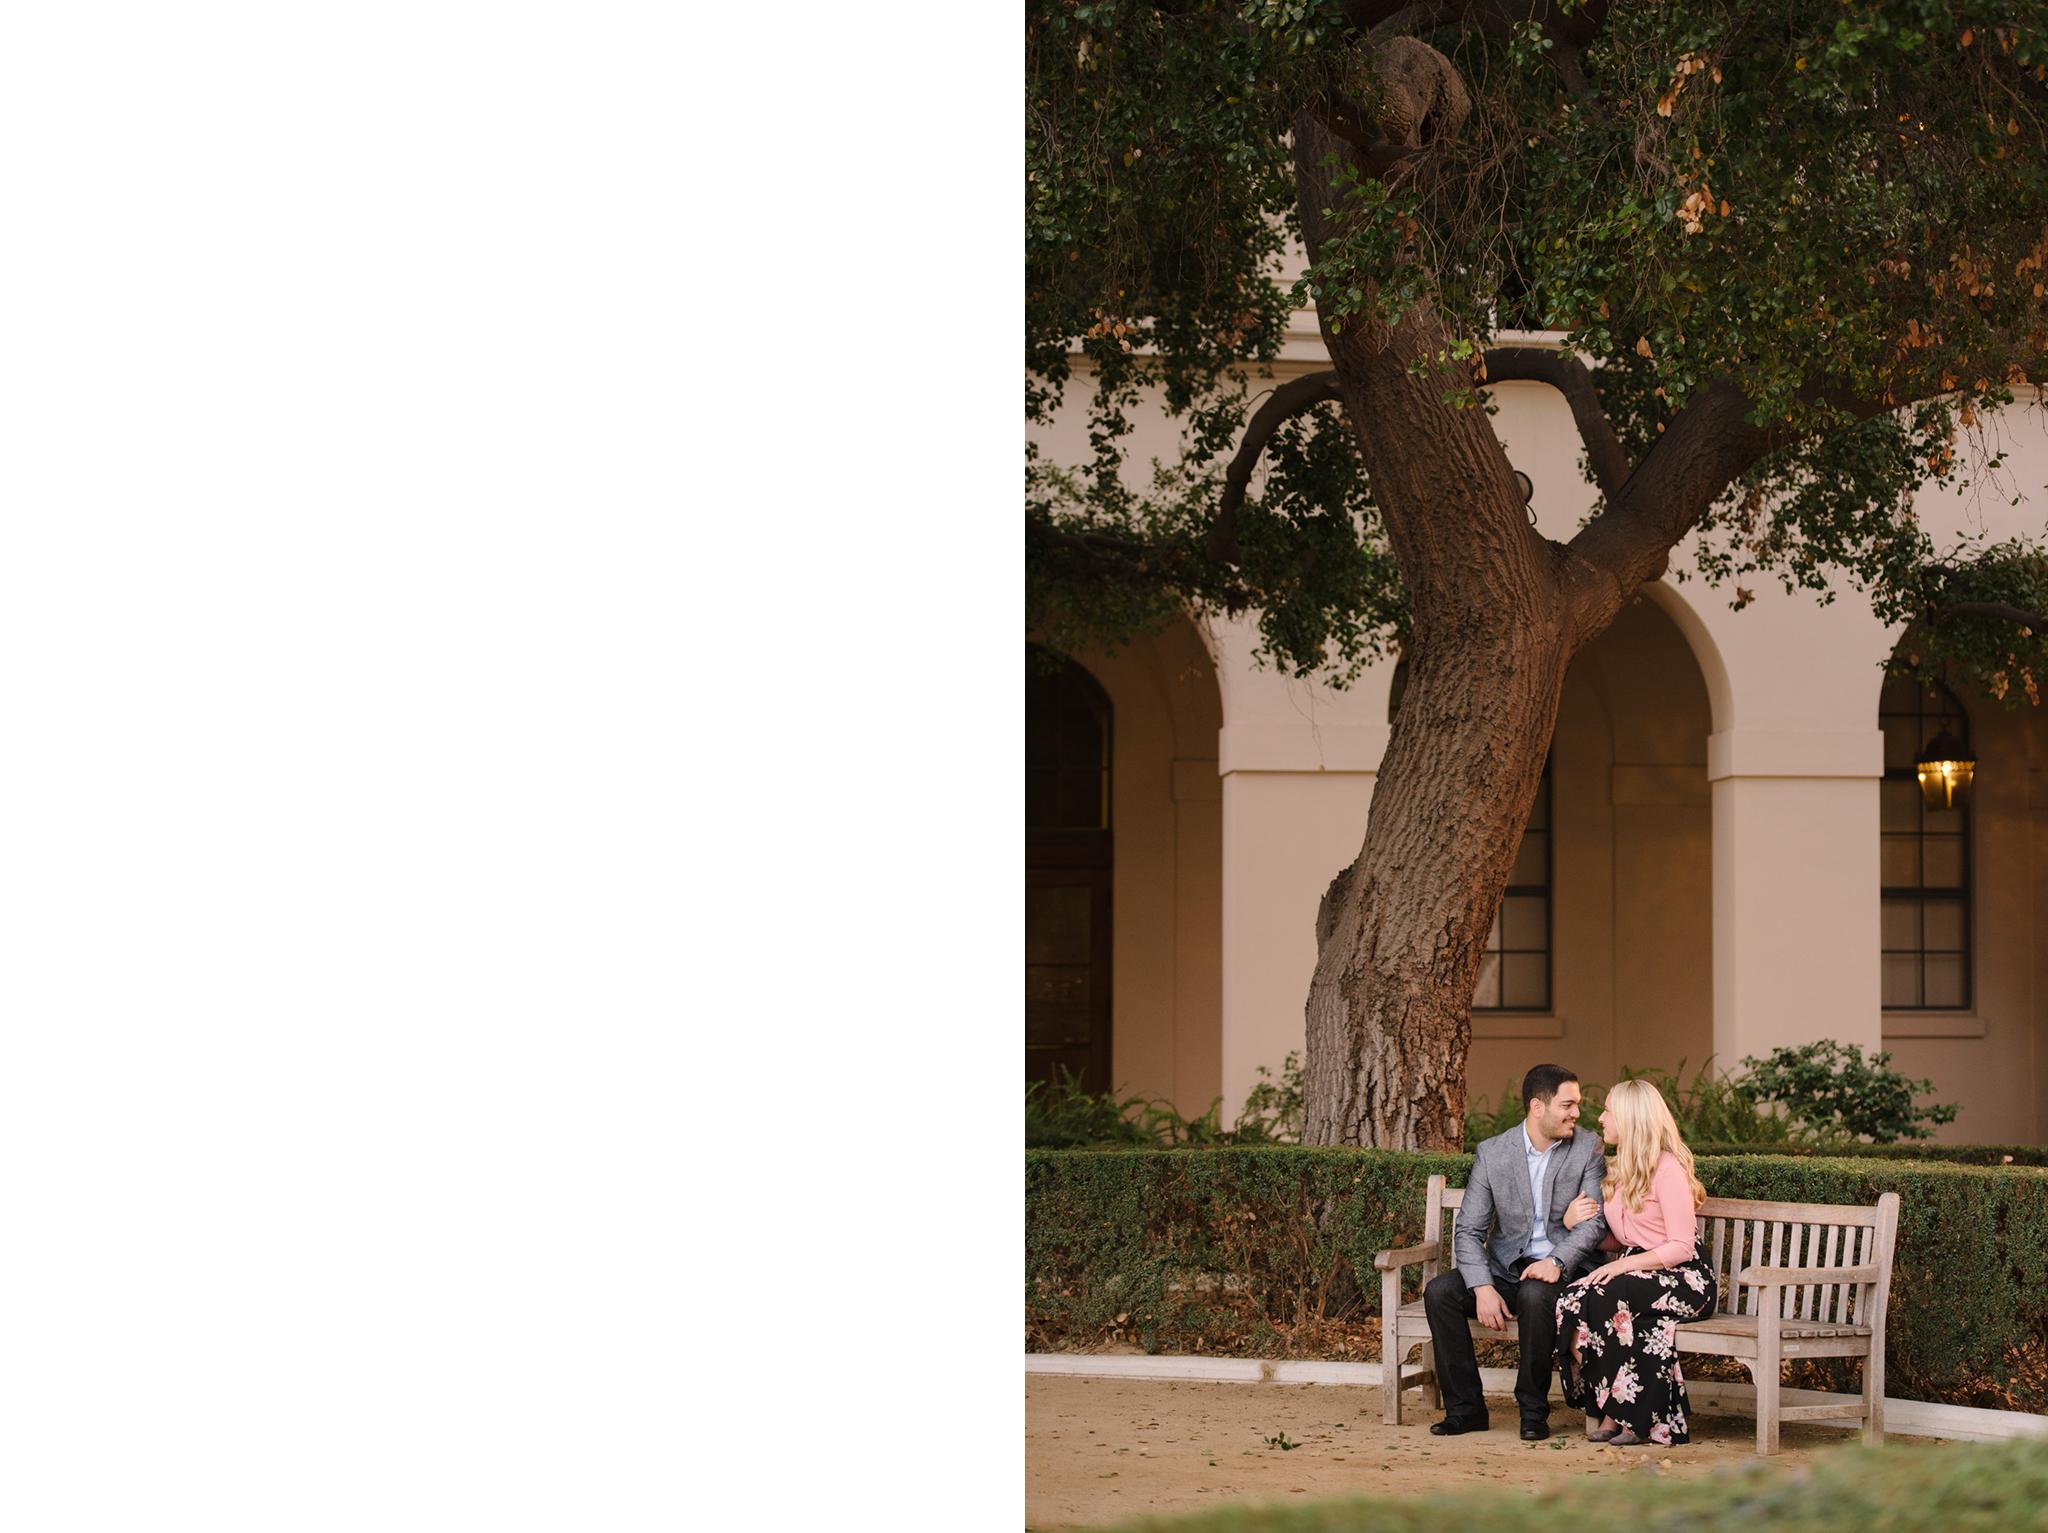 0012-JM-Pasadena-City-Hall-Los-Angeles-County-Engagement-Photography